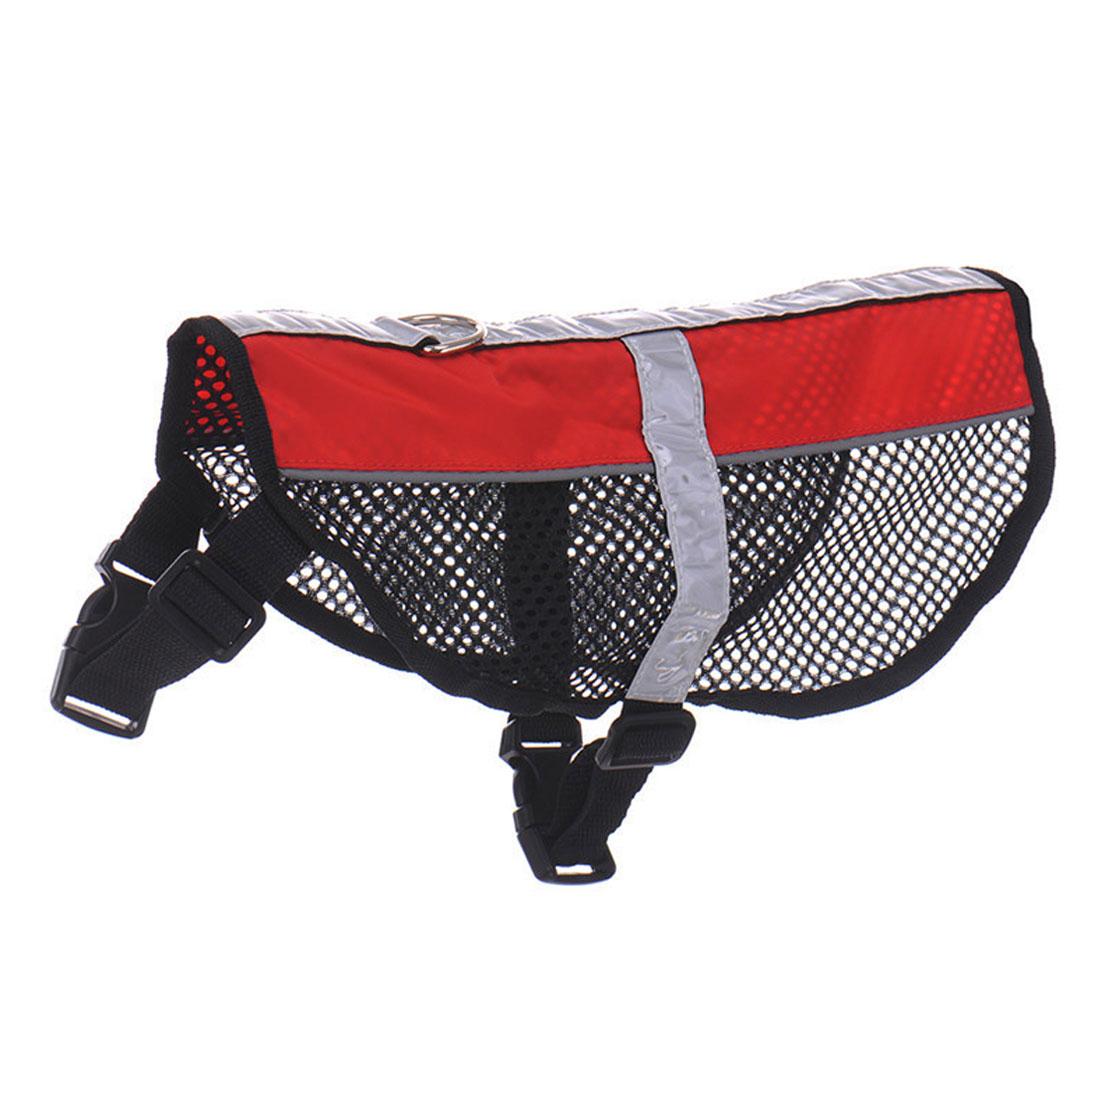 Nylon Service Dog Mesh Vest Harness Cool Comfort High Visibility Safety Jacket Red L